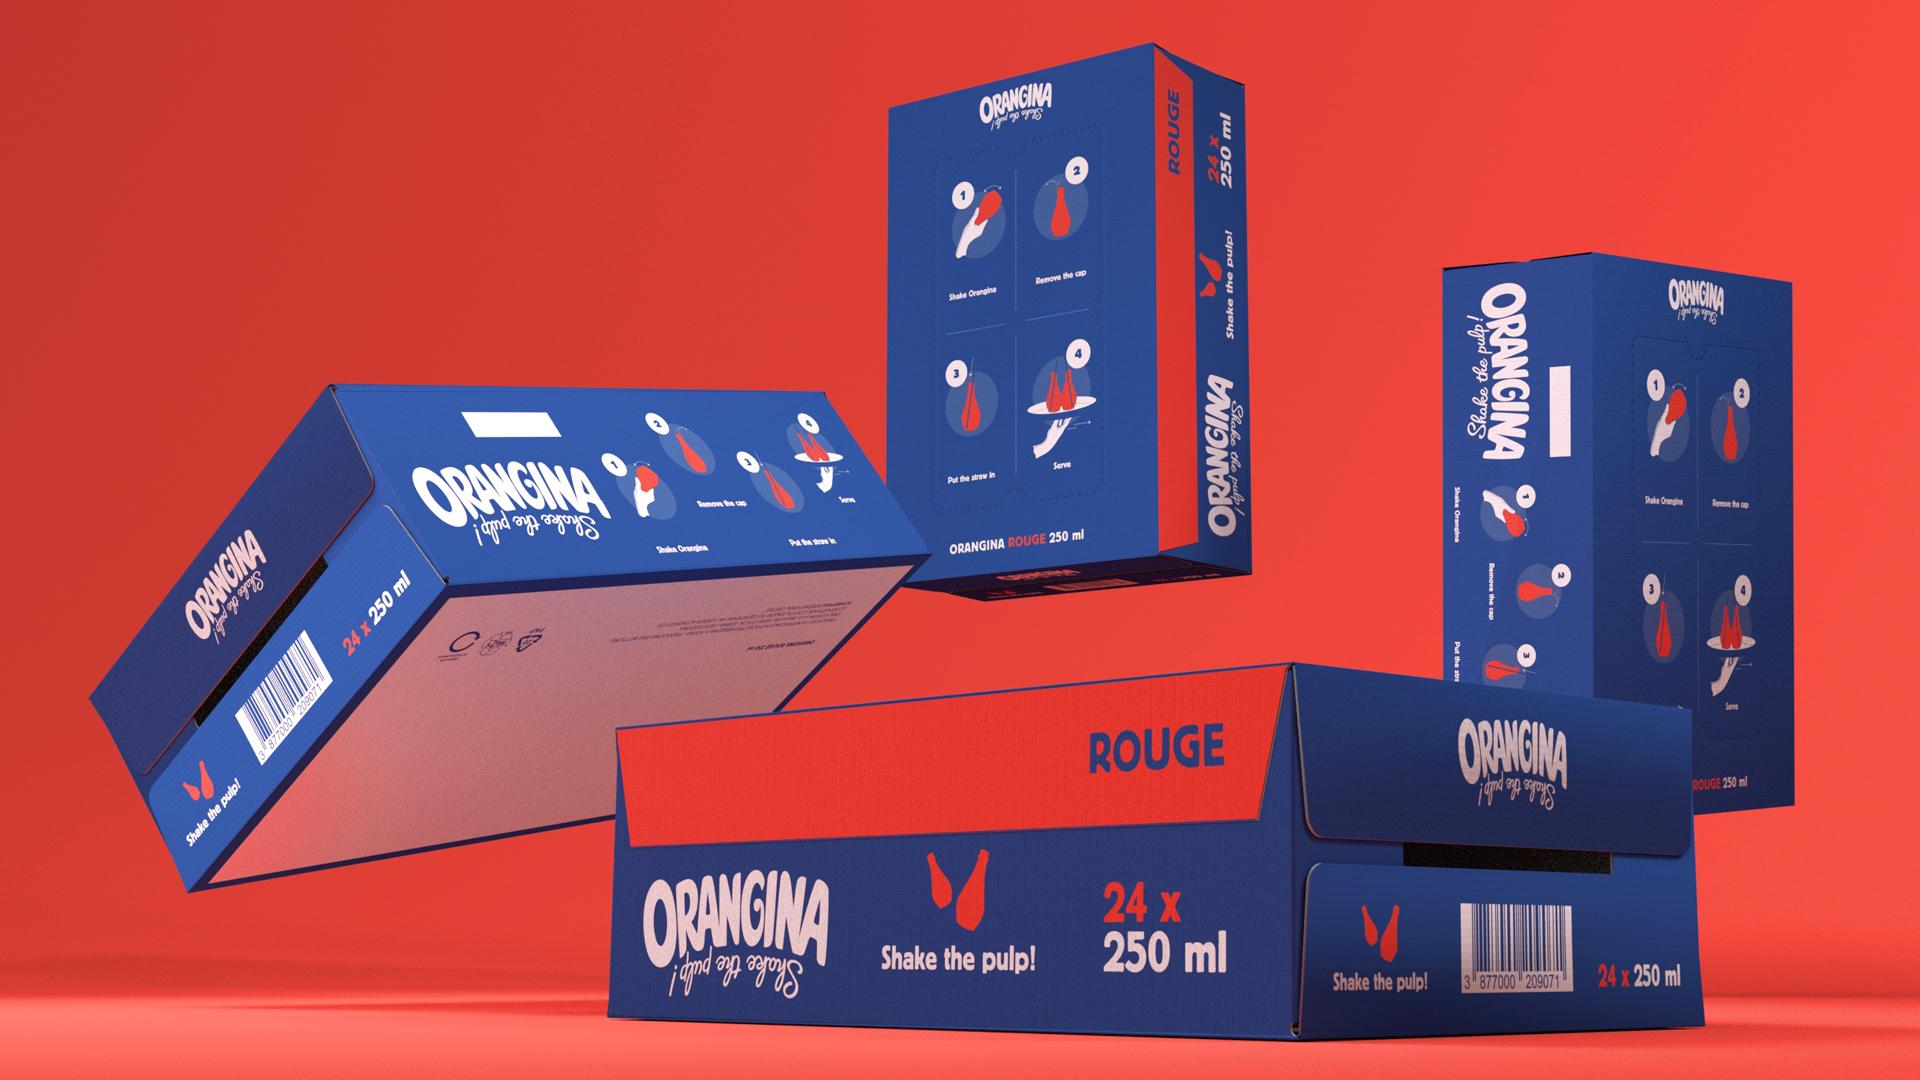 Orangina-Transport-Packaging-by-Emtisquare-9